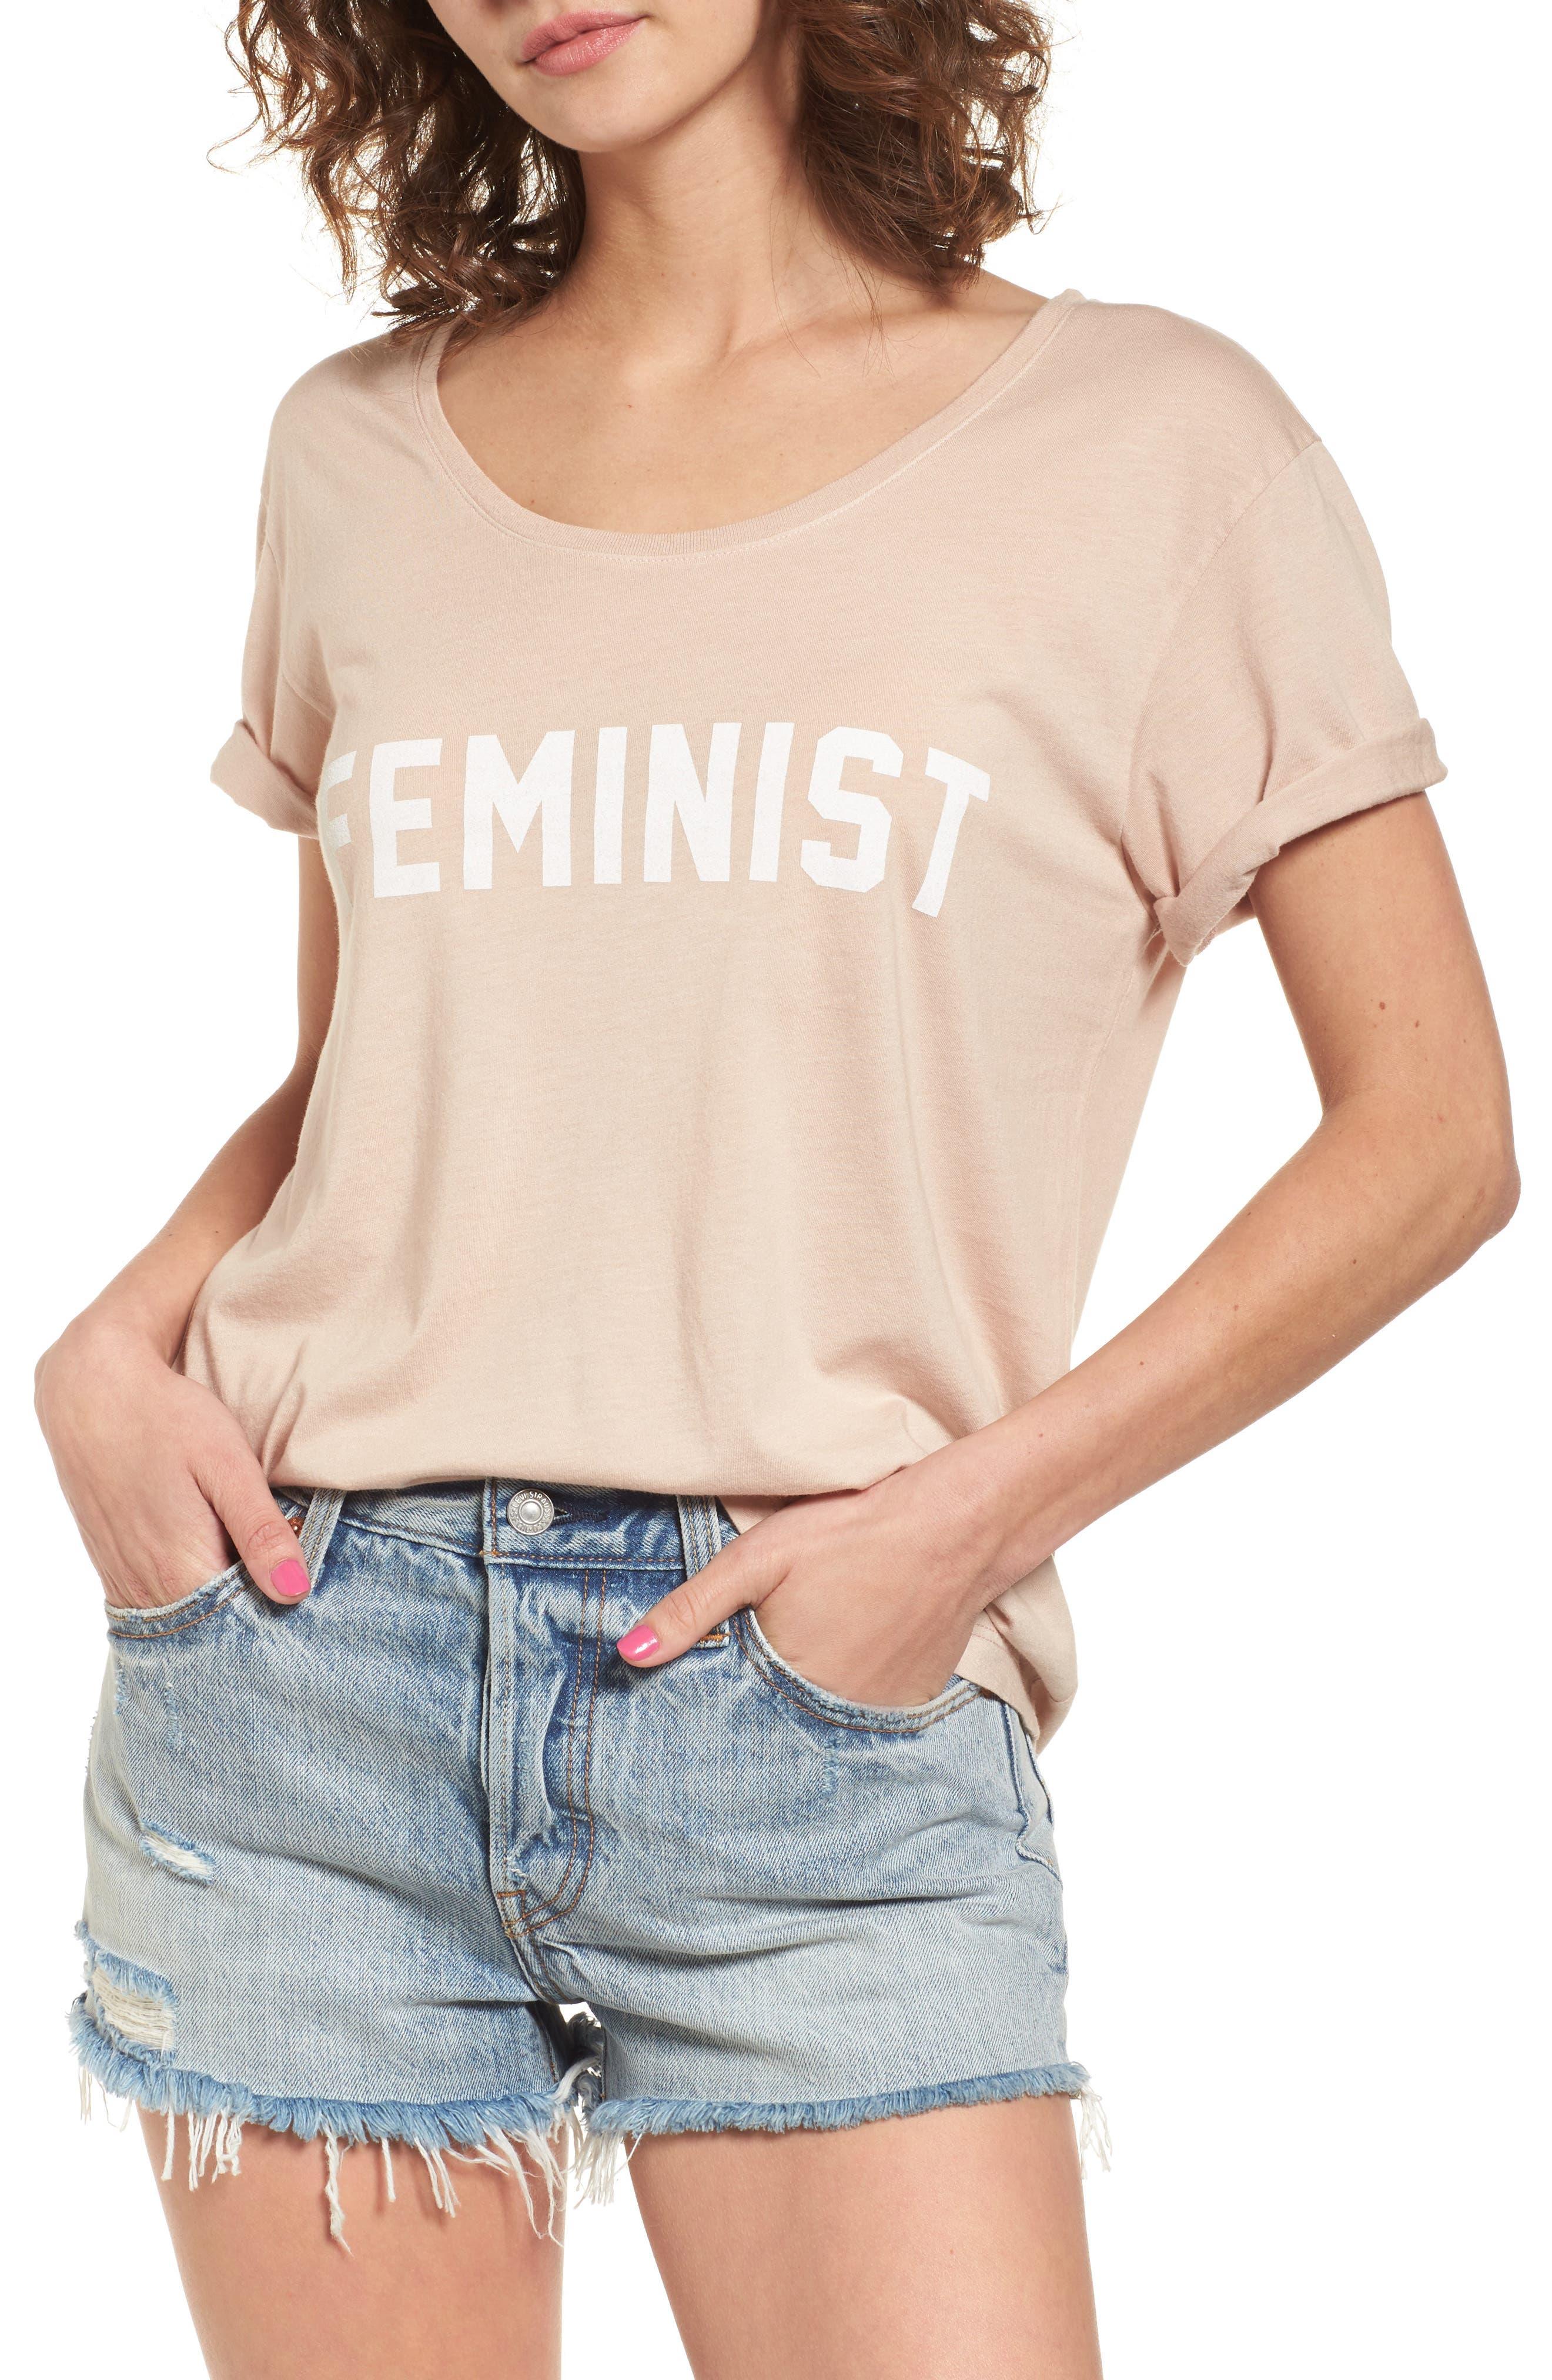 Daydreamer Feminist Graphic Tee